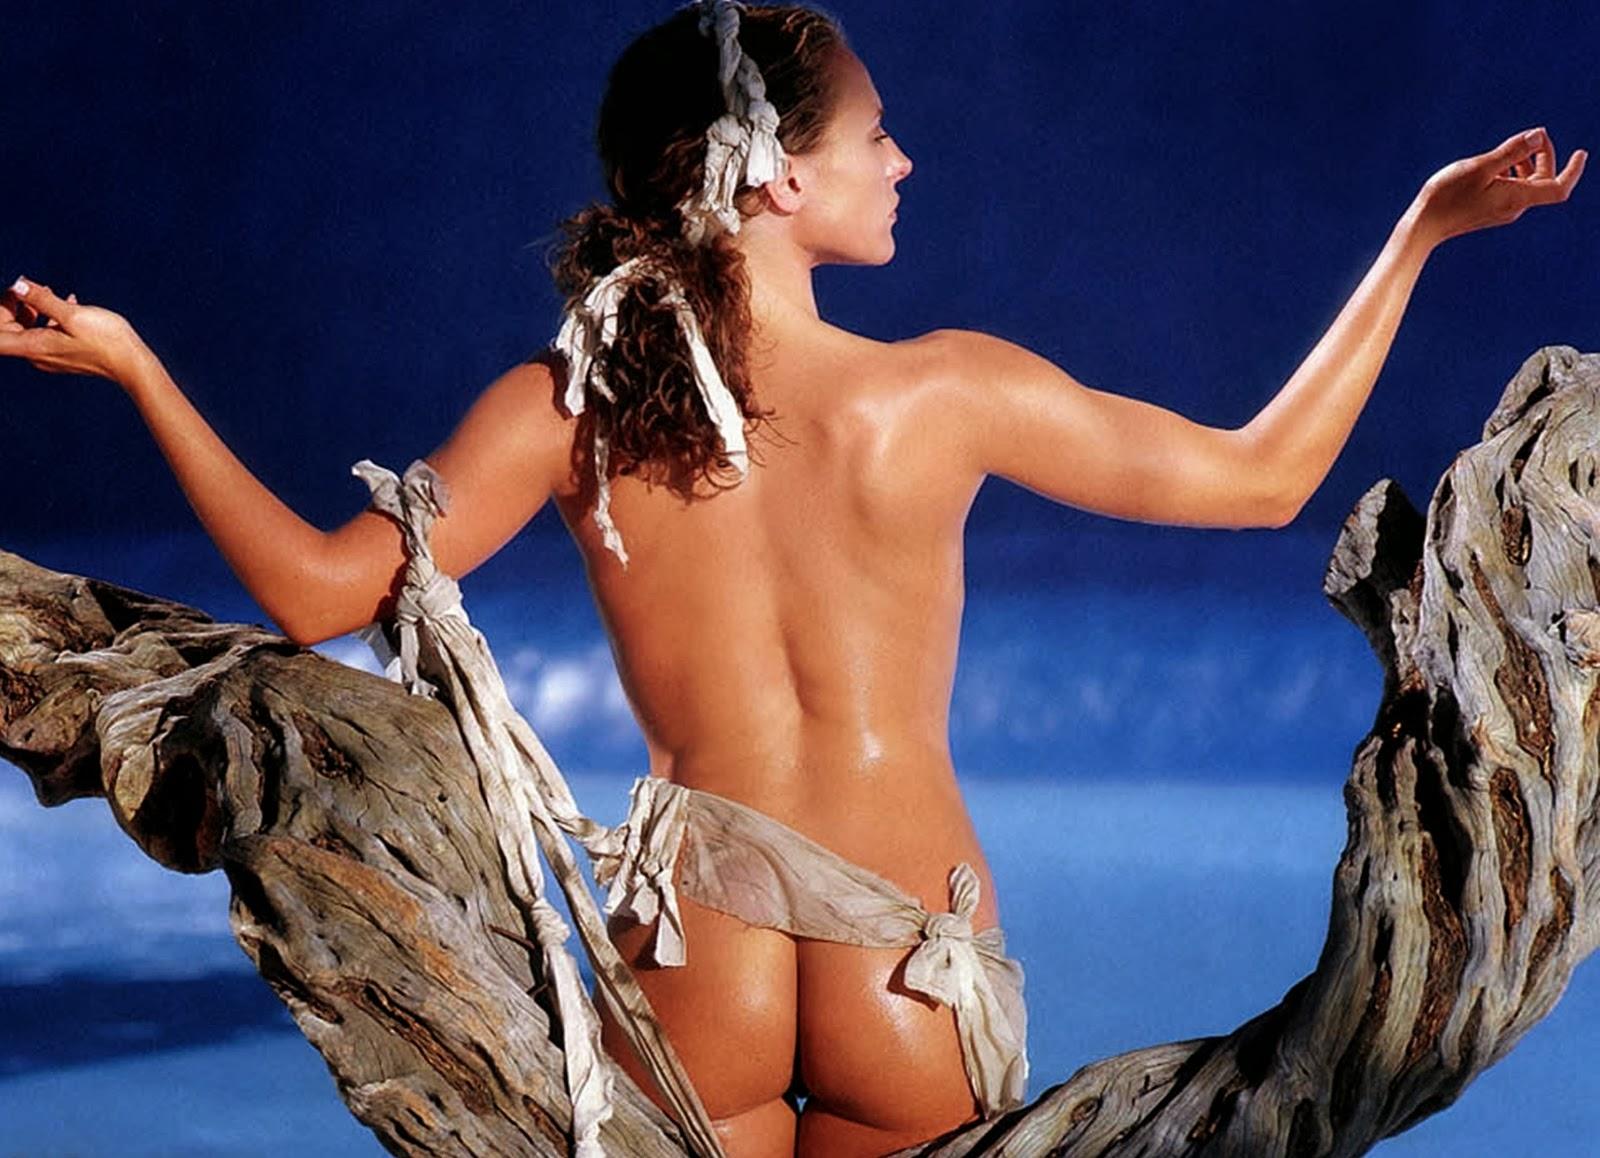 Amazonas girls riding porn tube videos nude scene